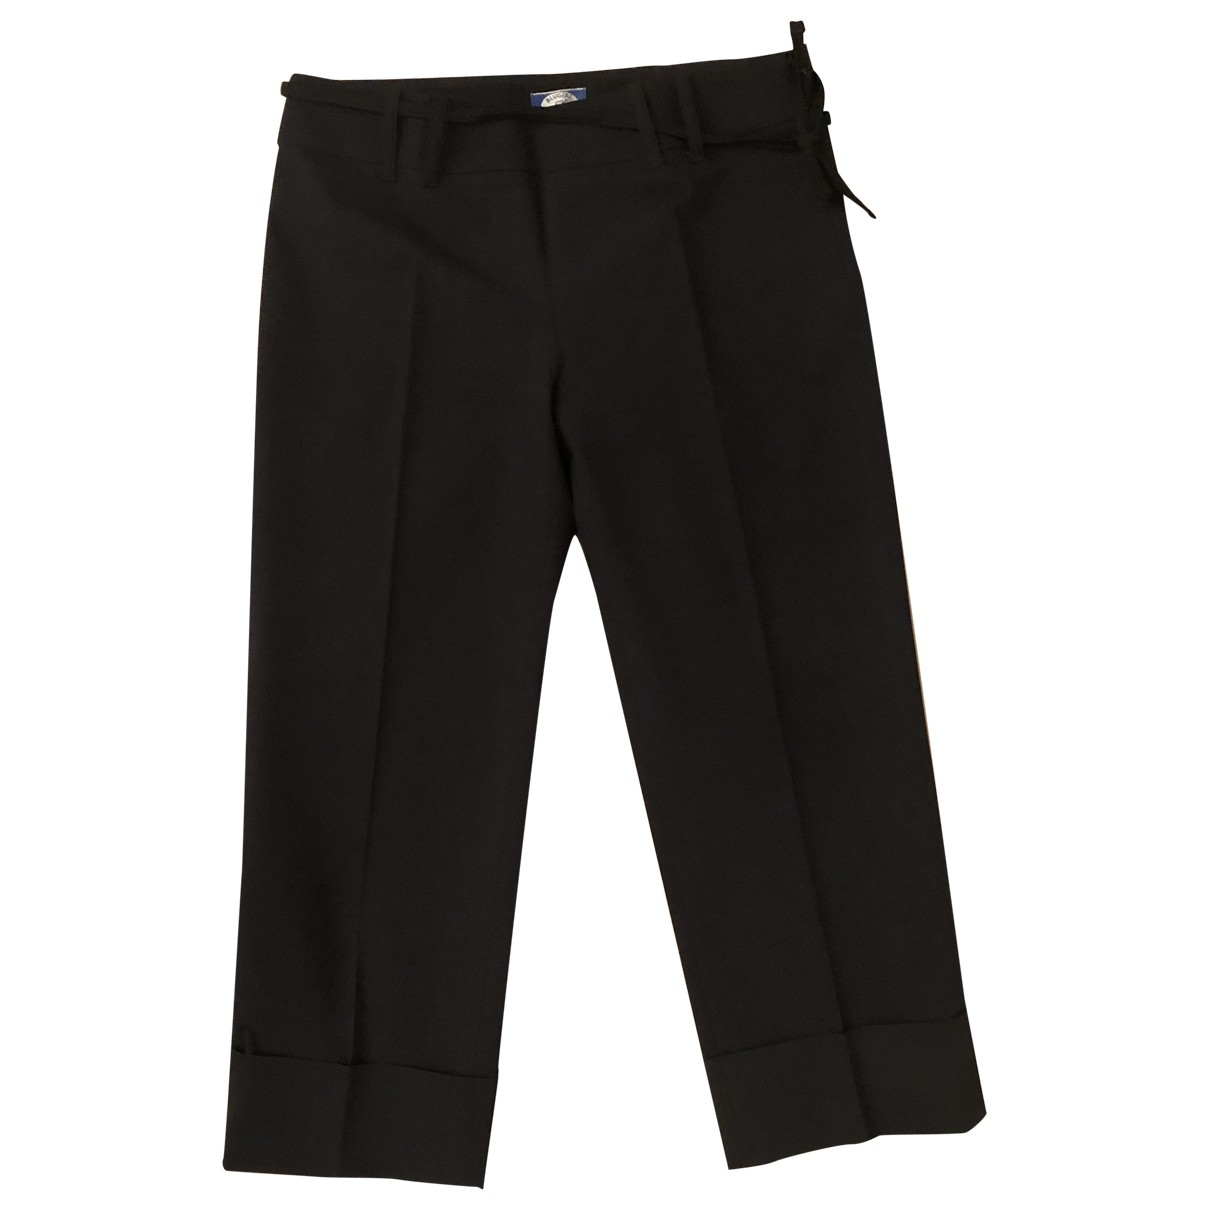 Pantalon en Poliester Negro Blumarine